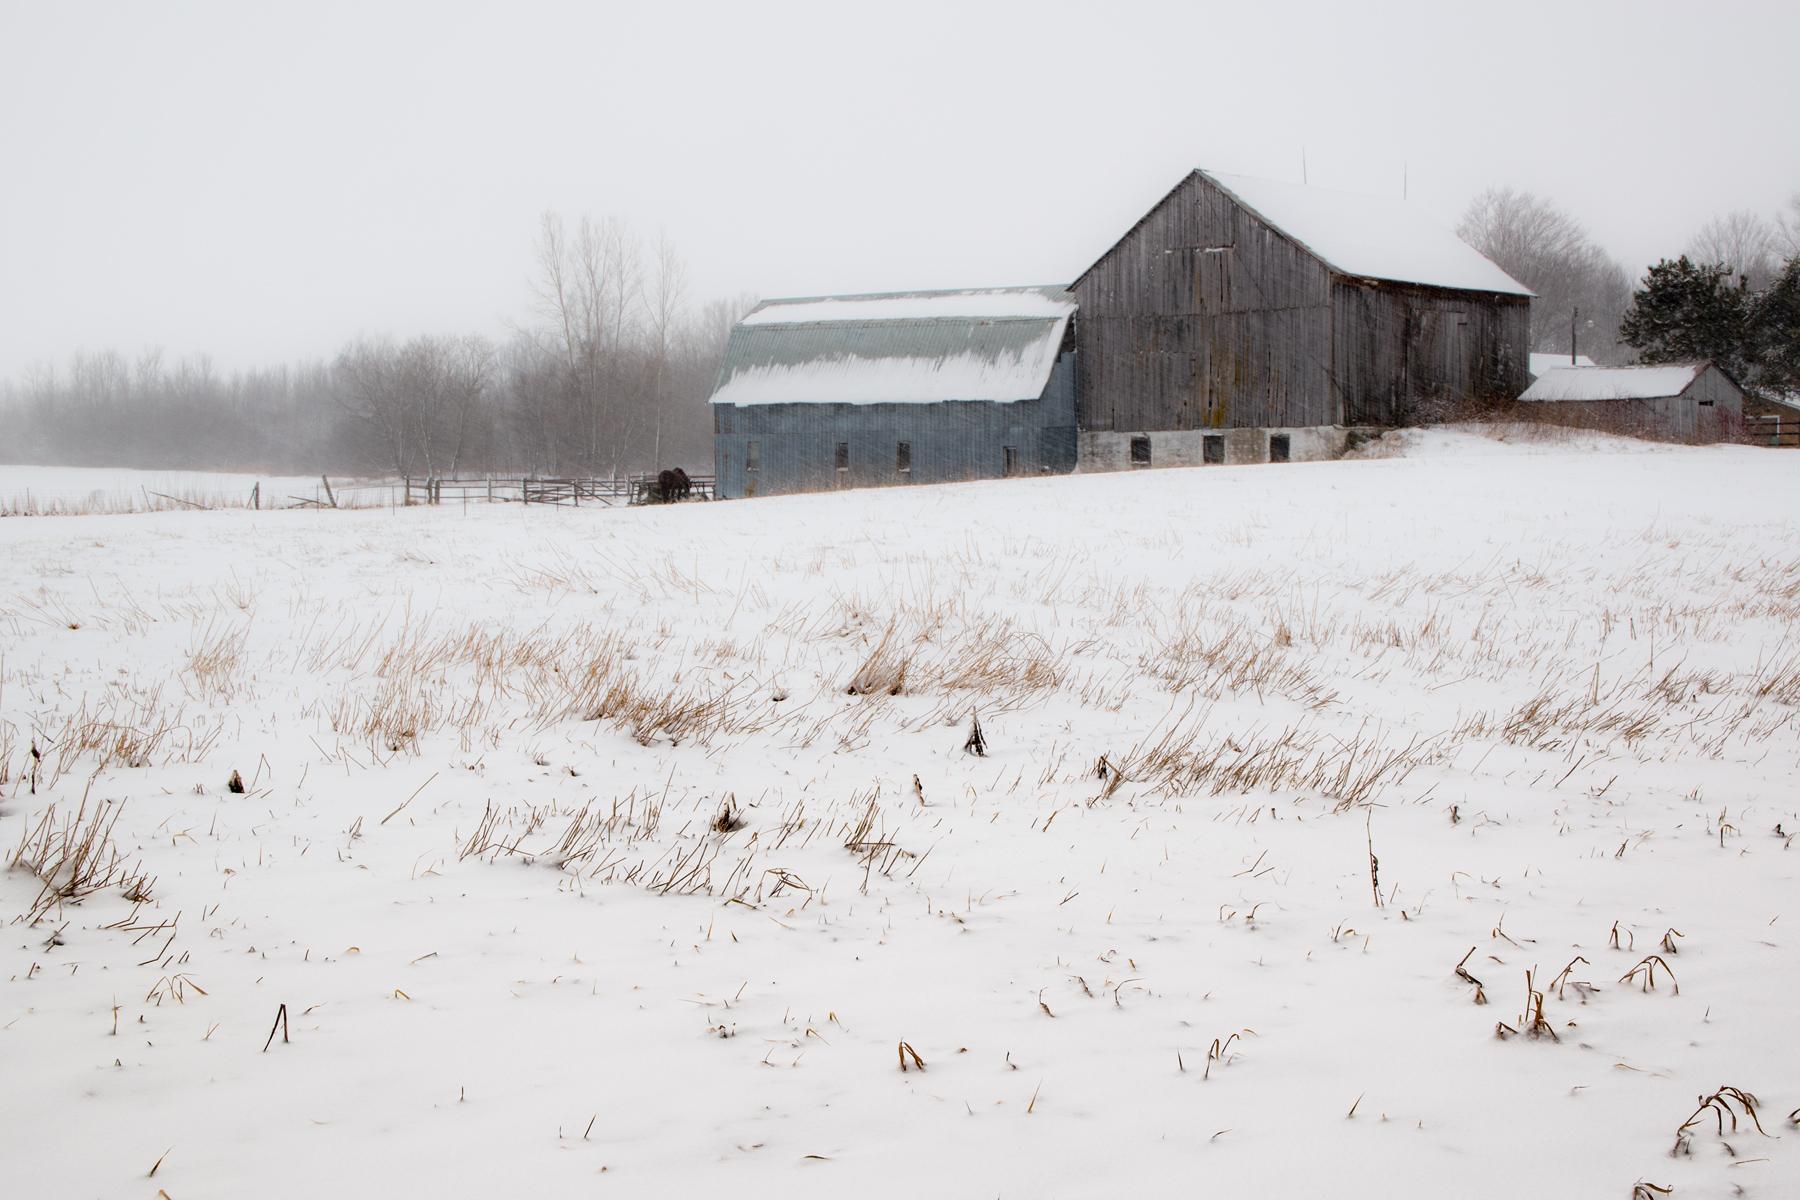 https://0901.nccdn.net/4_2/000/000/084/68b/barn-in-snow-storm-4x6.jpg